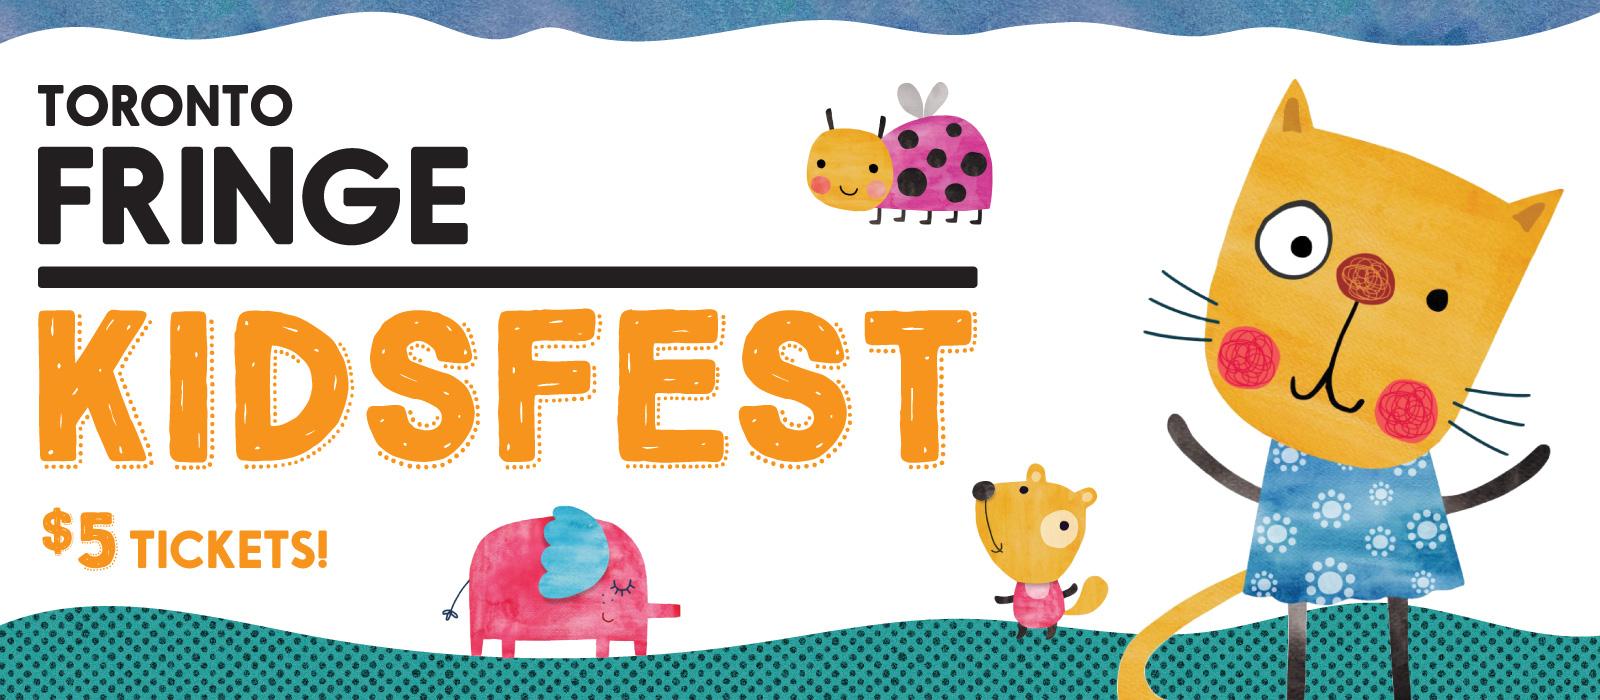 Toronto Fringe Kidsfest: $5 dollar tickets